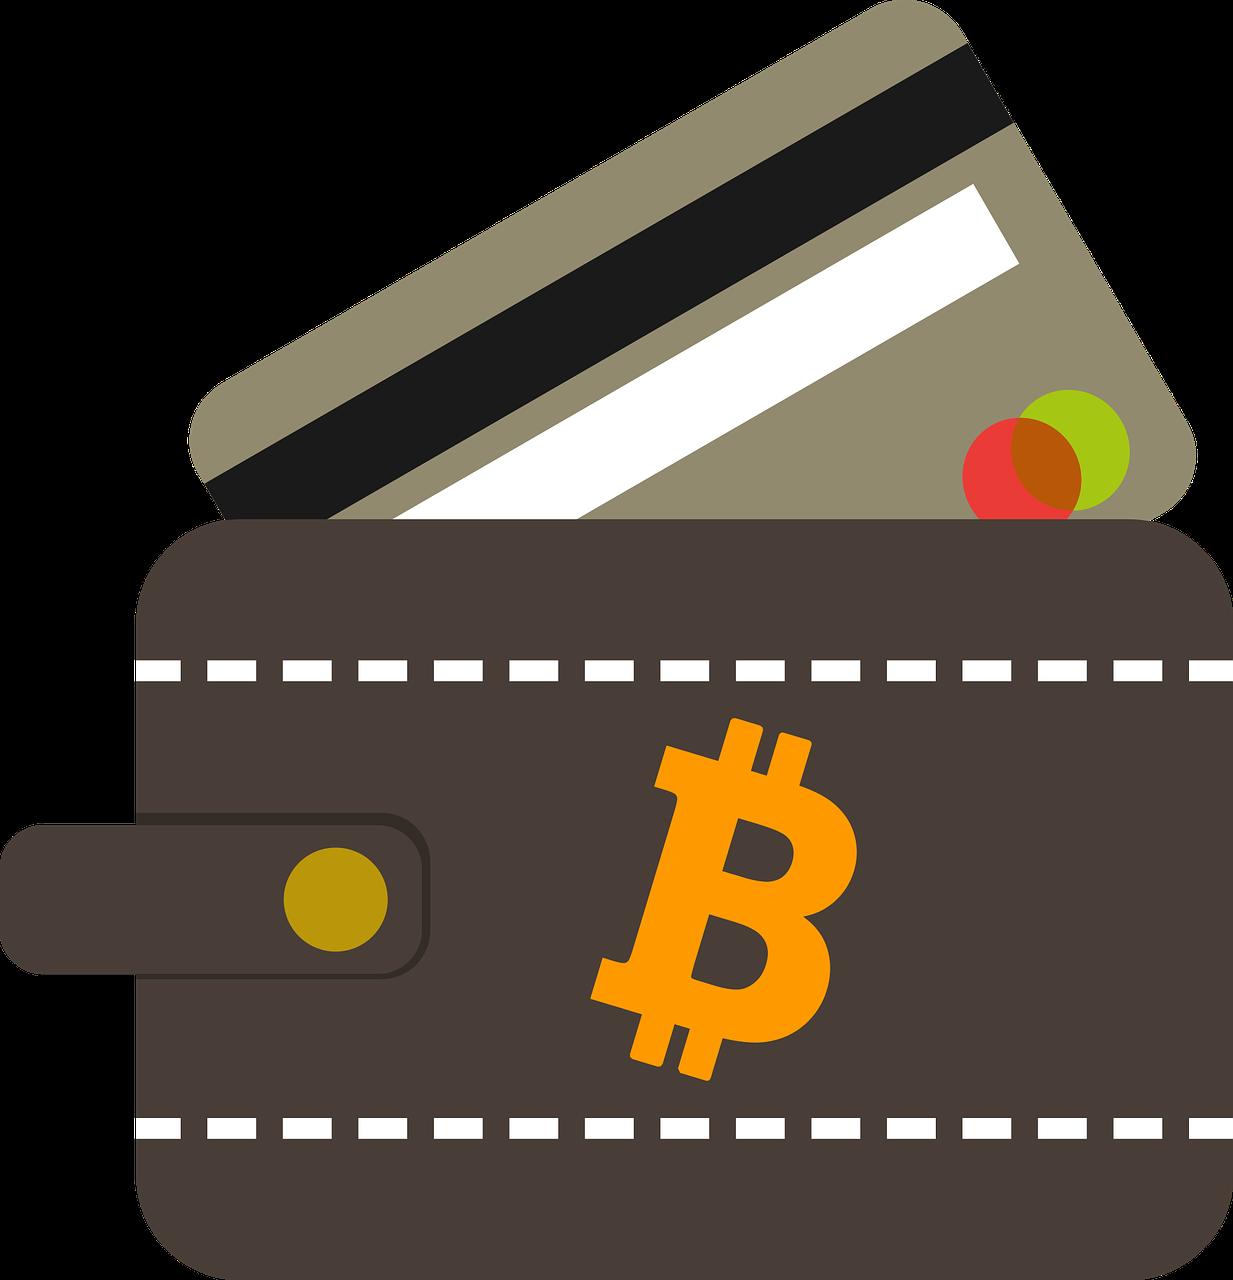 Bitcoin Wallet Not Digital Cash Storage